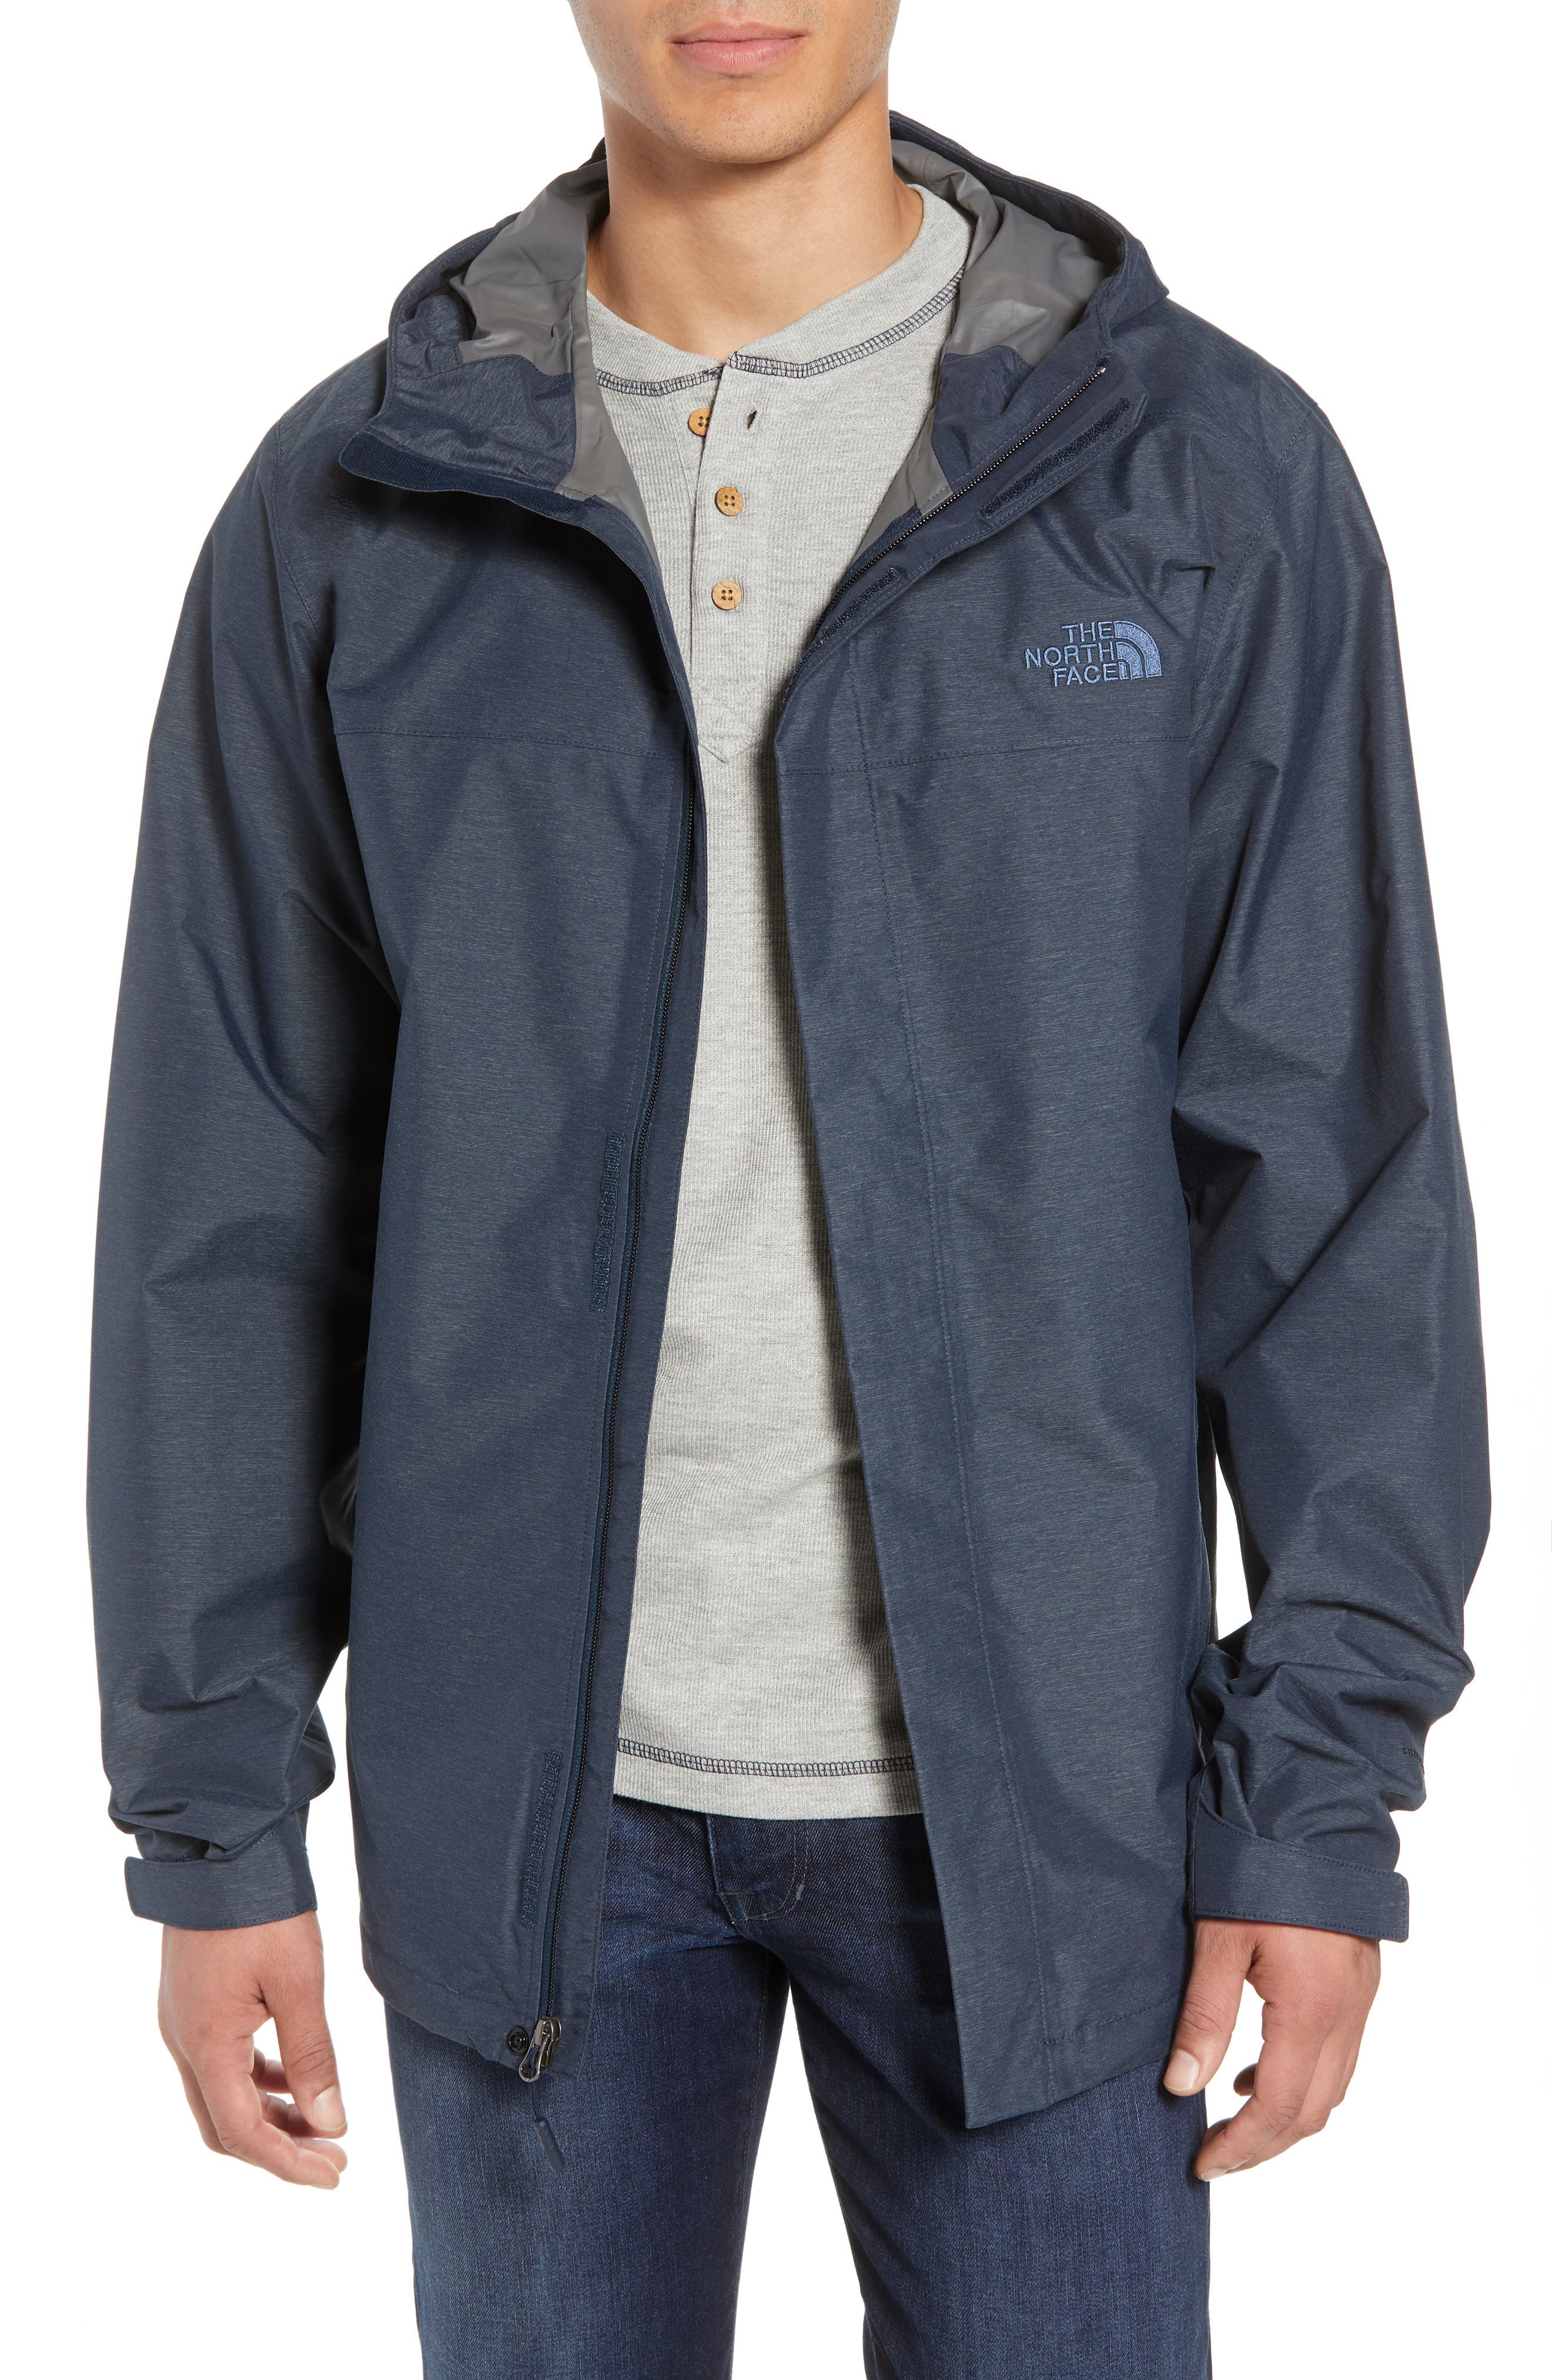 Venture 2 Waterproof Jacket,                         Main,                         color, URBAN NAVY HEATHER